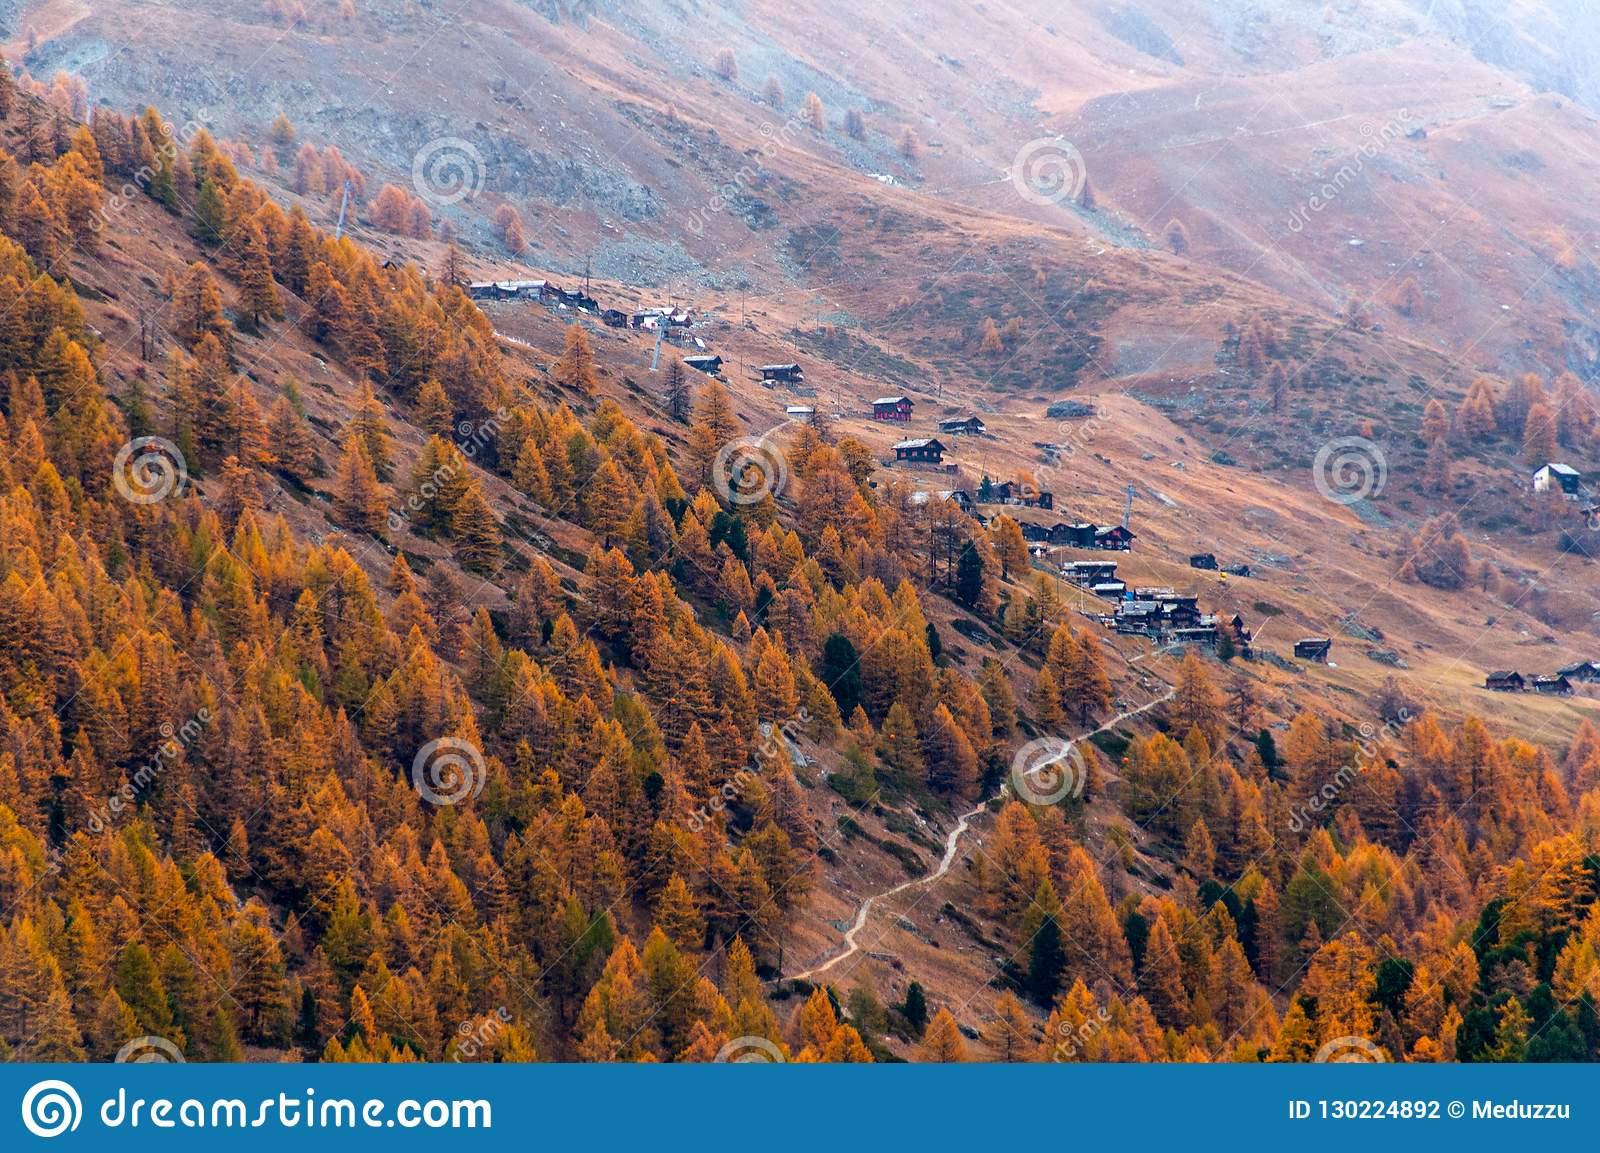 Beautiful autumn landscape with many old chalets in Zermatt area